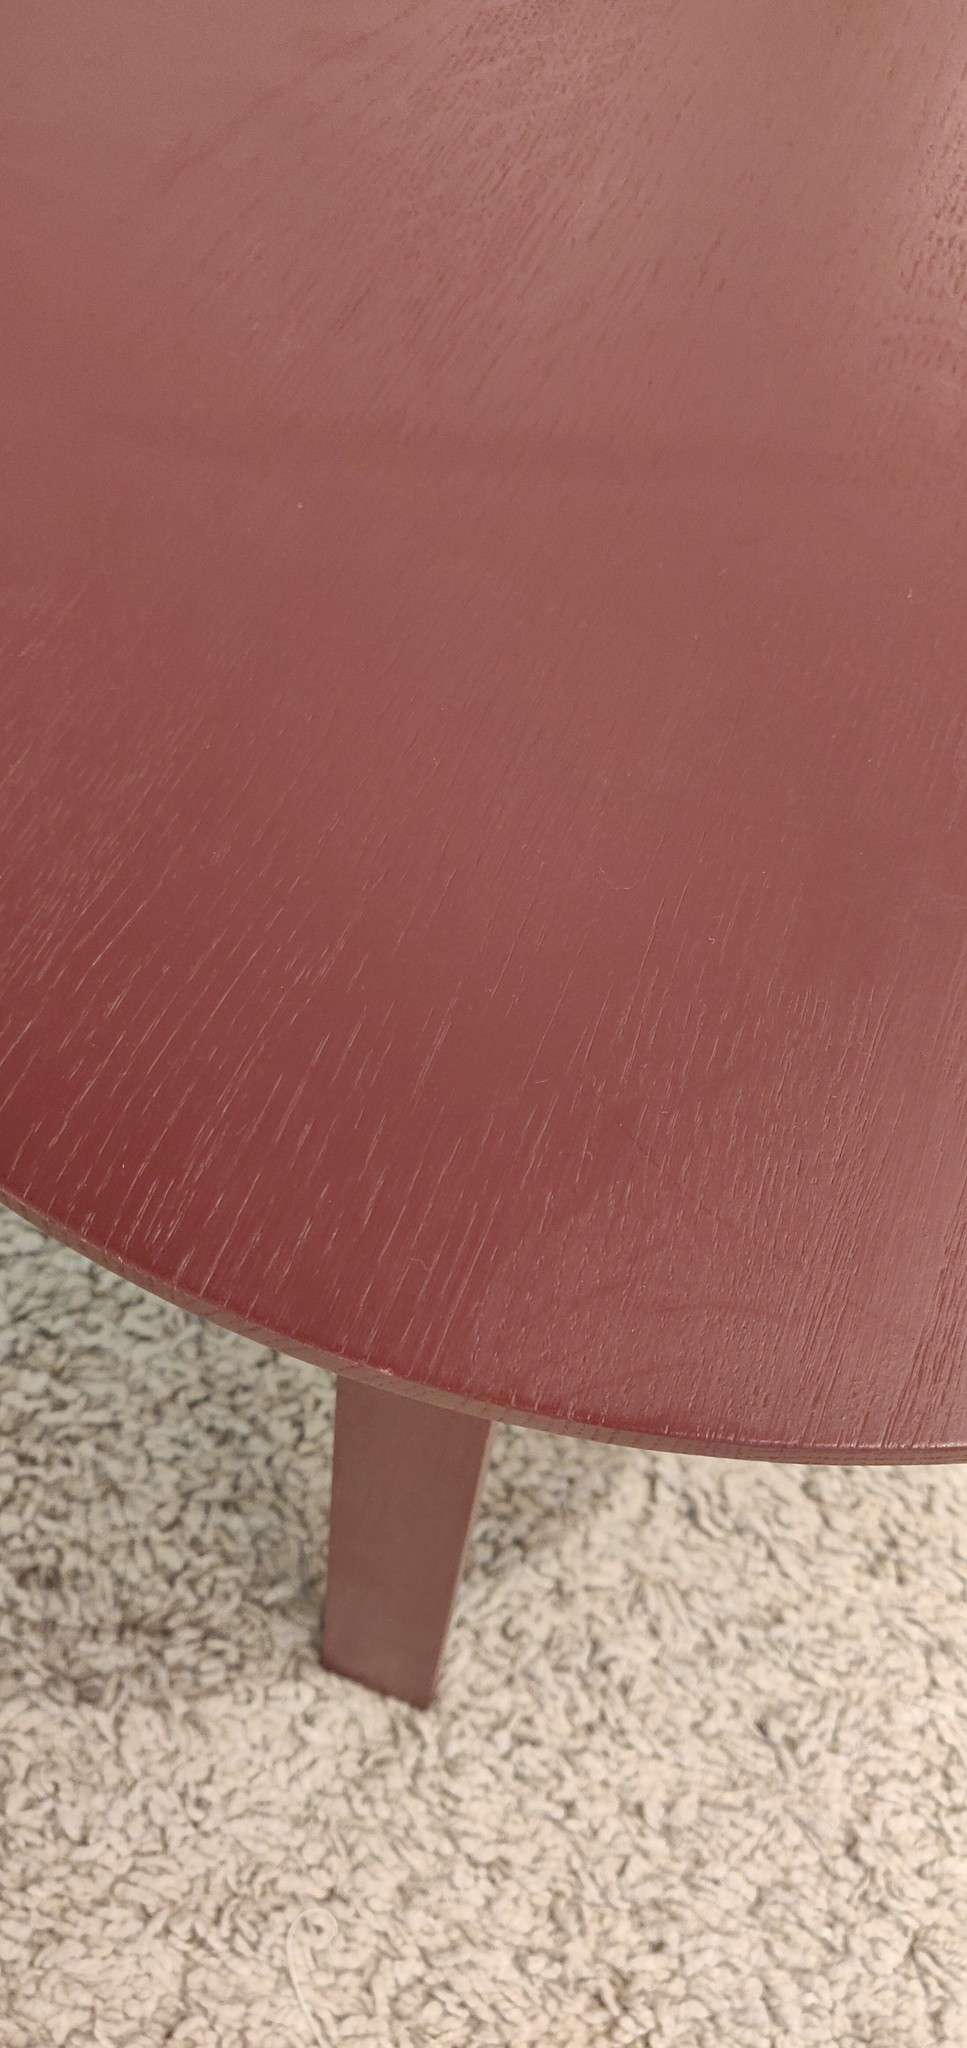 Toonzaalmodel Bella coffee table  Ø45 X H49 dark brick stained oak-2